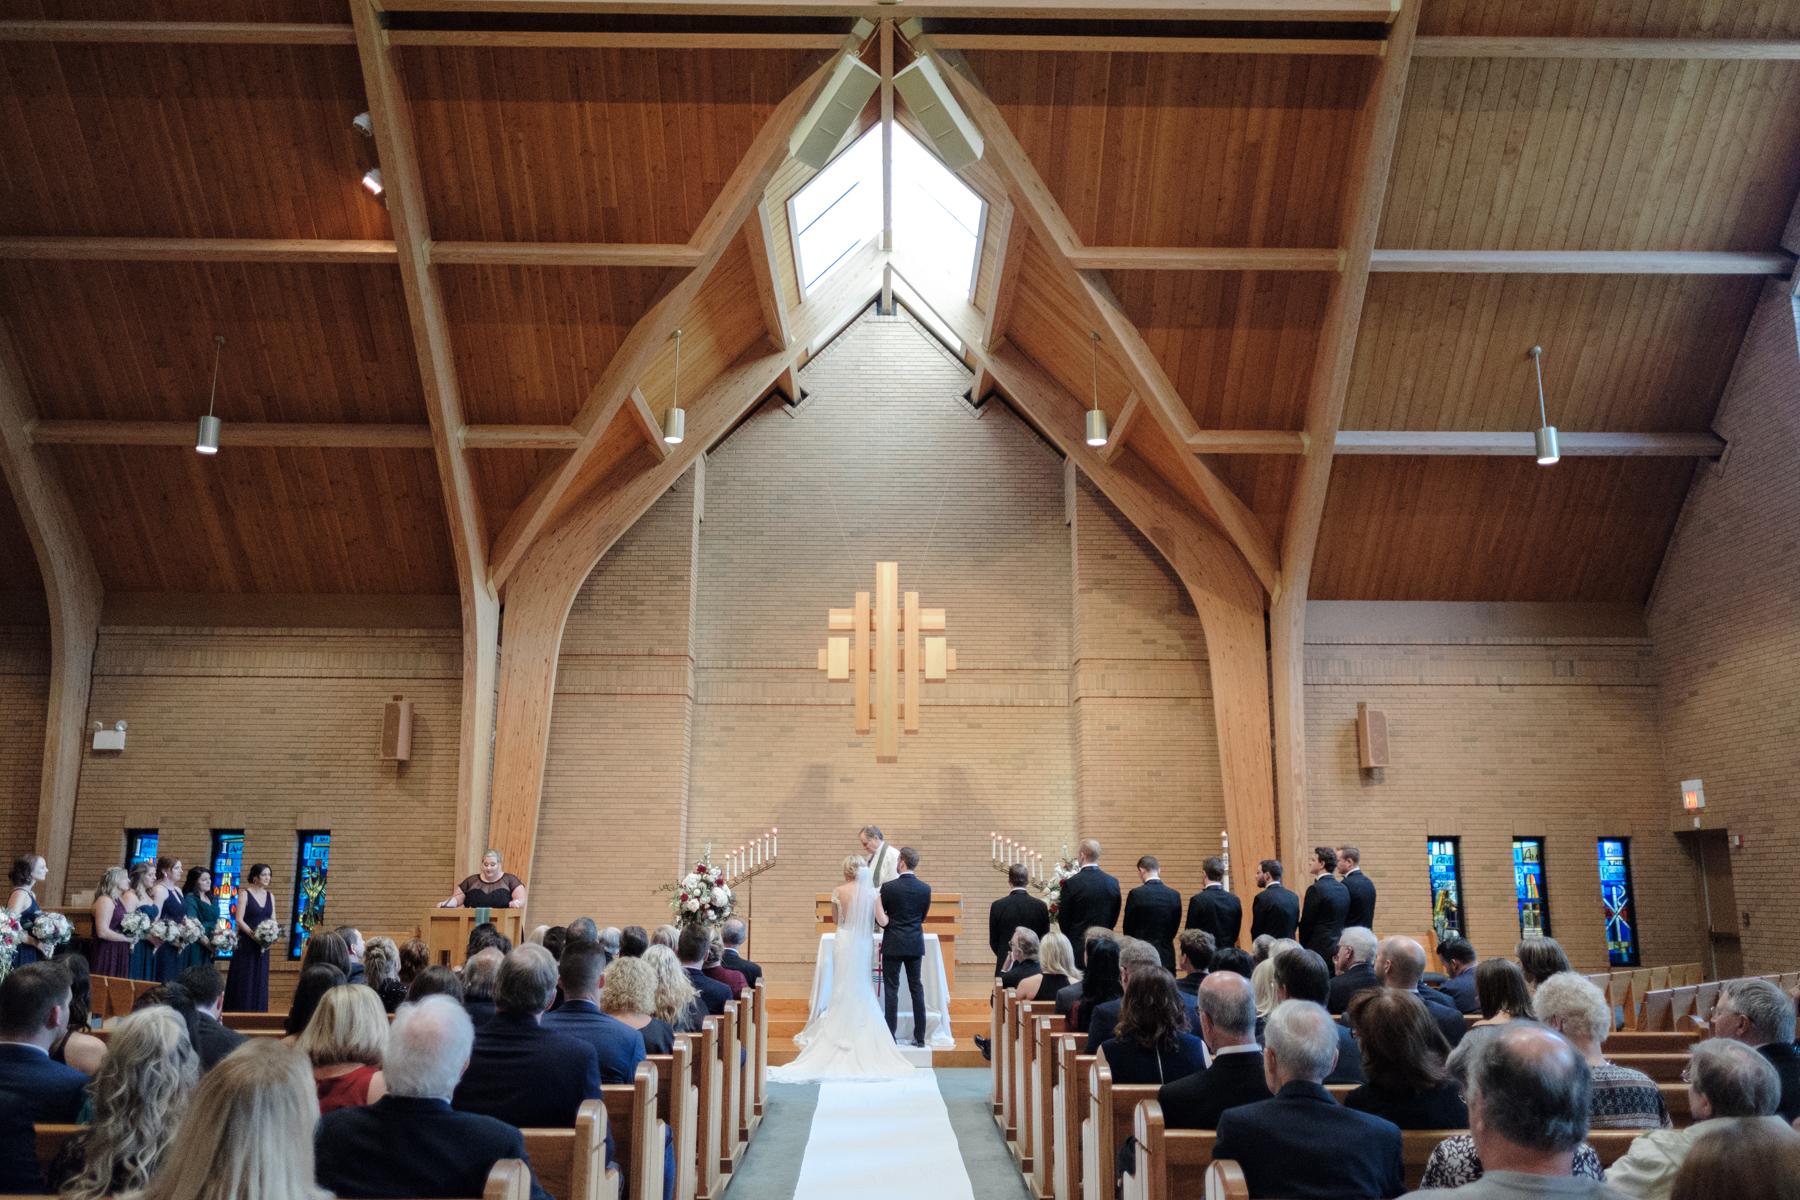 2017_BAP_KalliMatt_Gleneagles_CountryClub_Lemont_Wedding-38.jpg